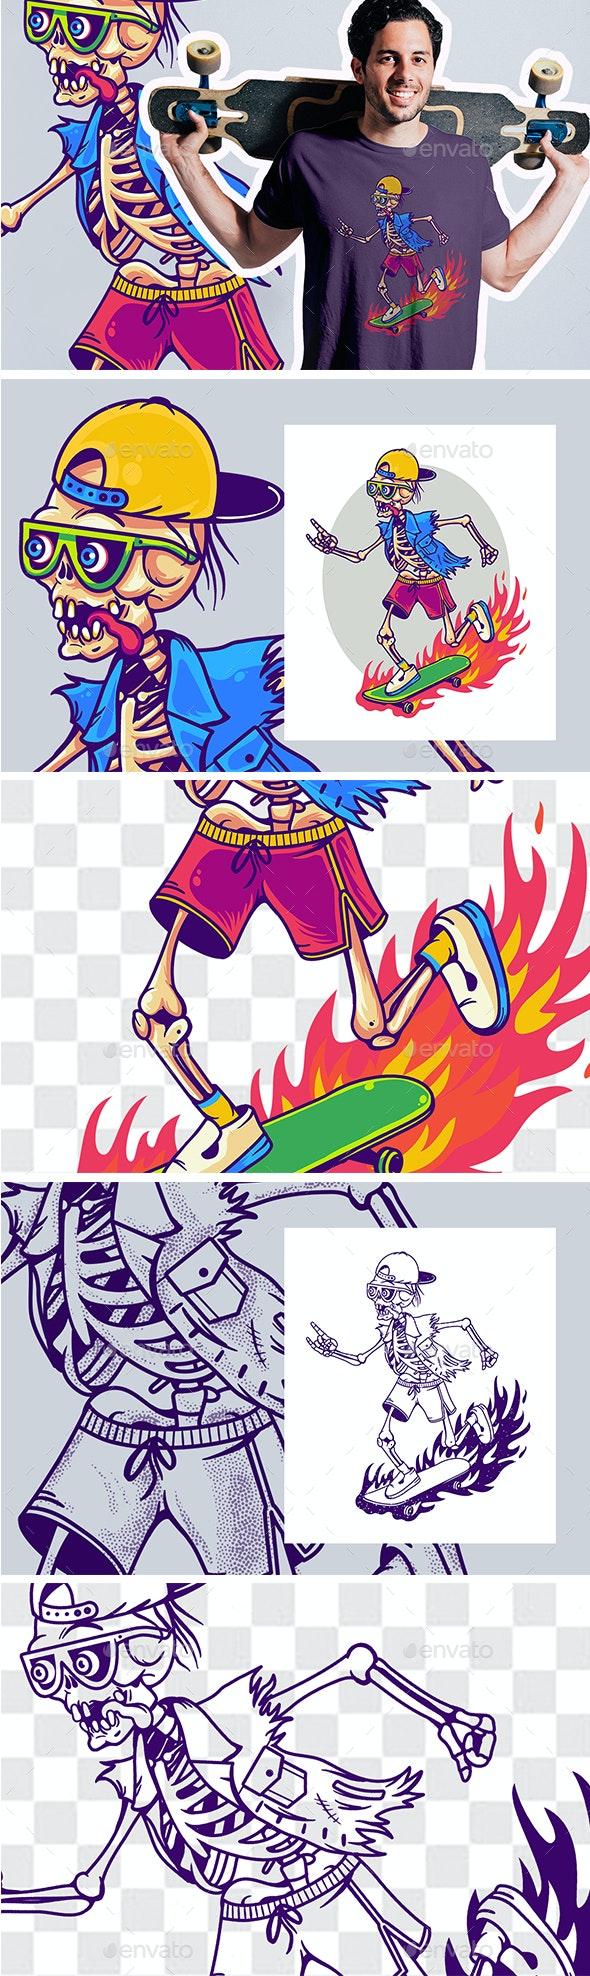 Funny Cartoon Skeleton On Skateboard - Vectors